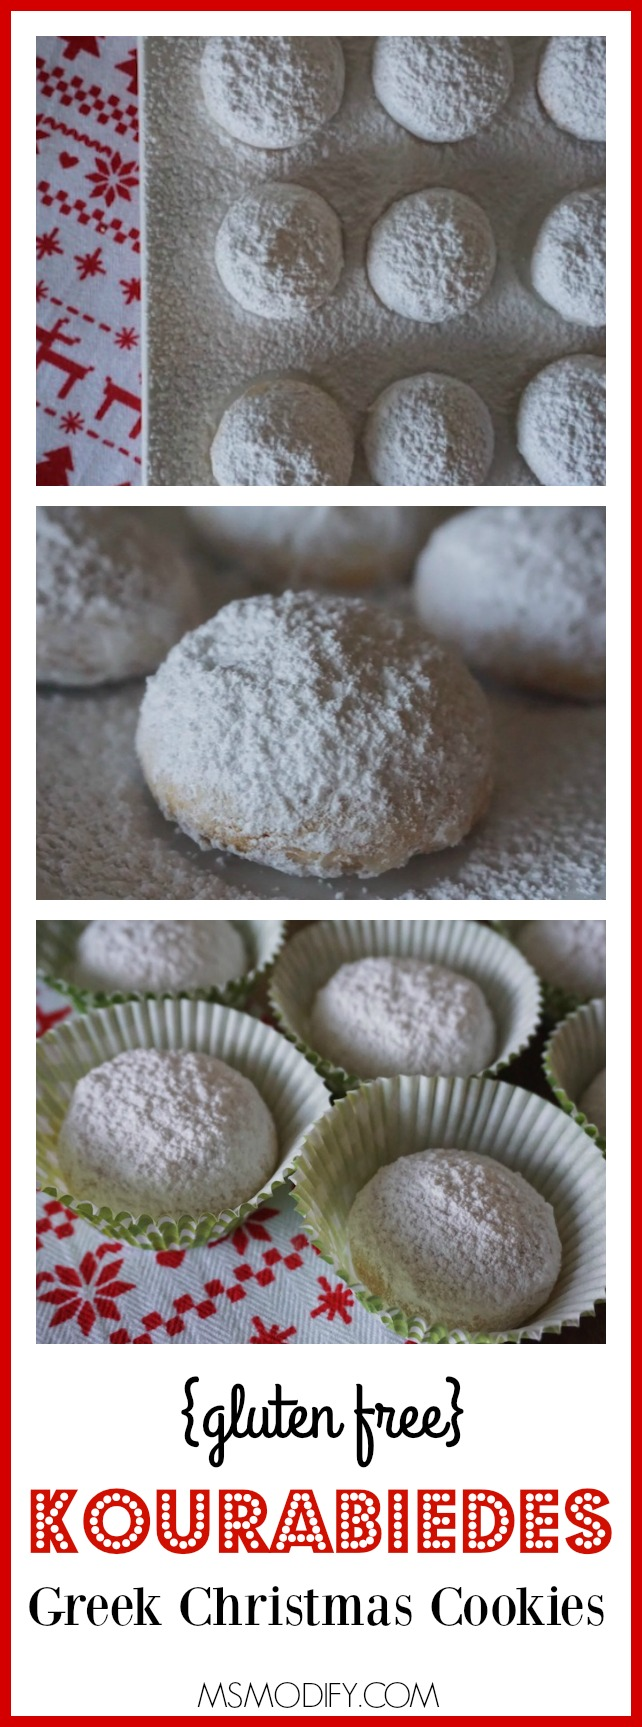 {gluten free} Kourambiedes - Greek Christmas Cookies